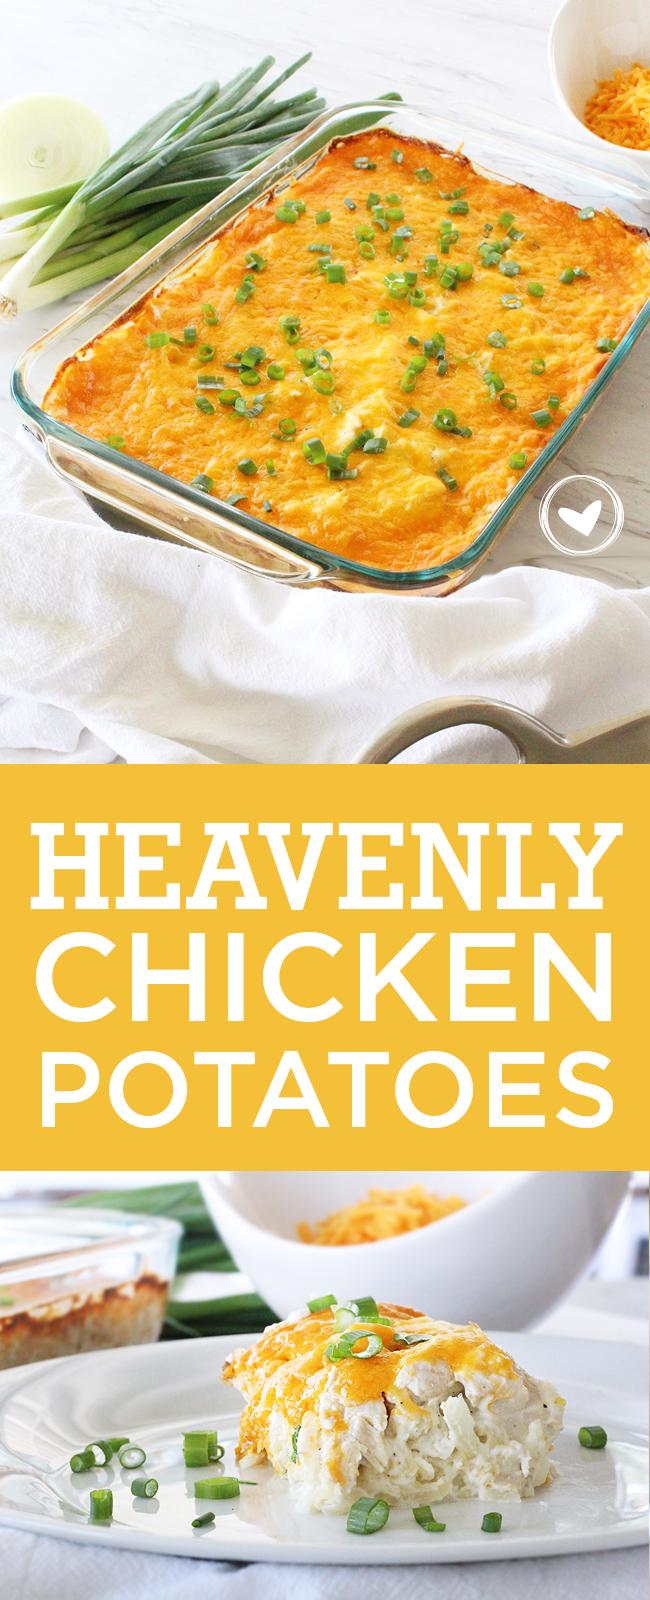 The best Heavenly Chicken Potatoes